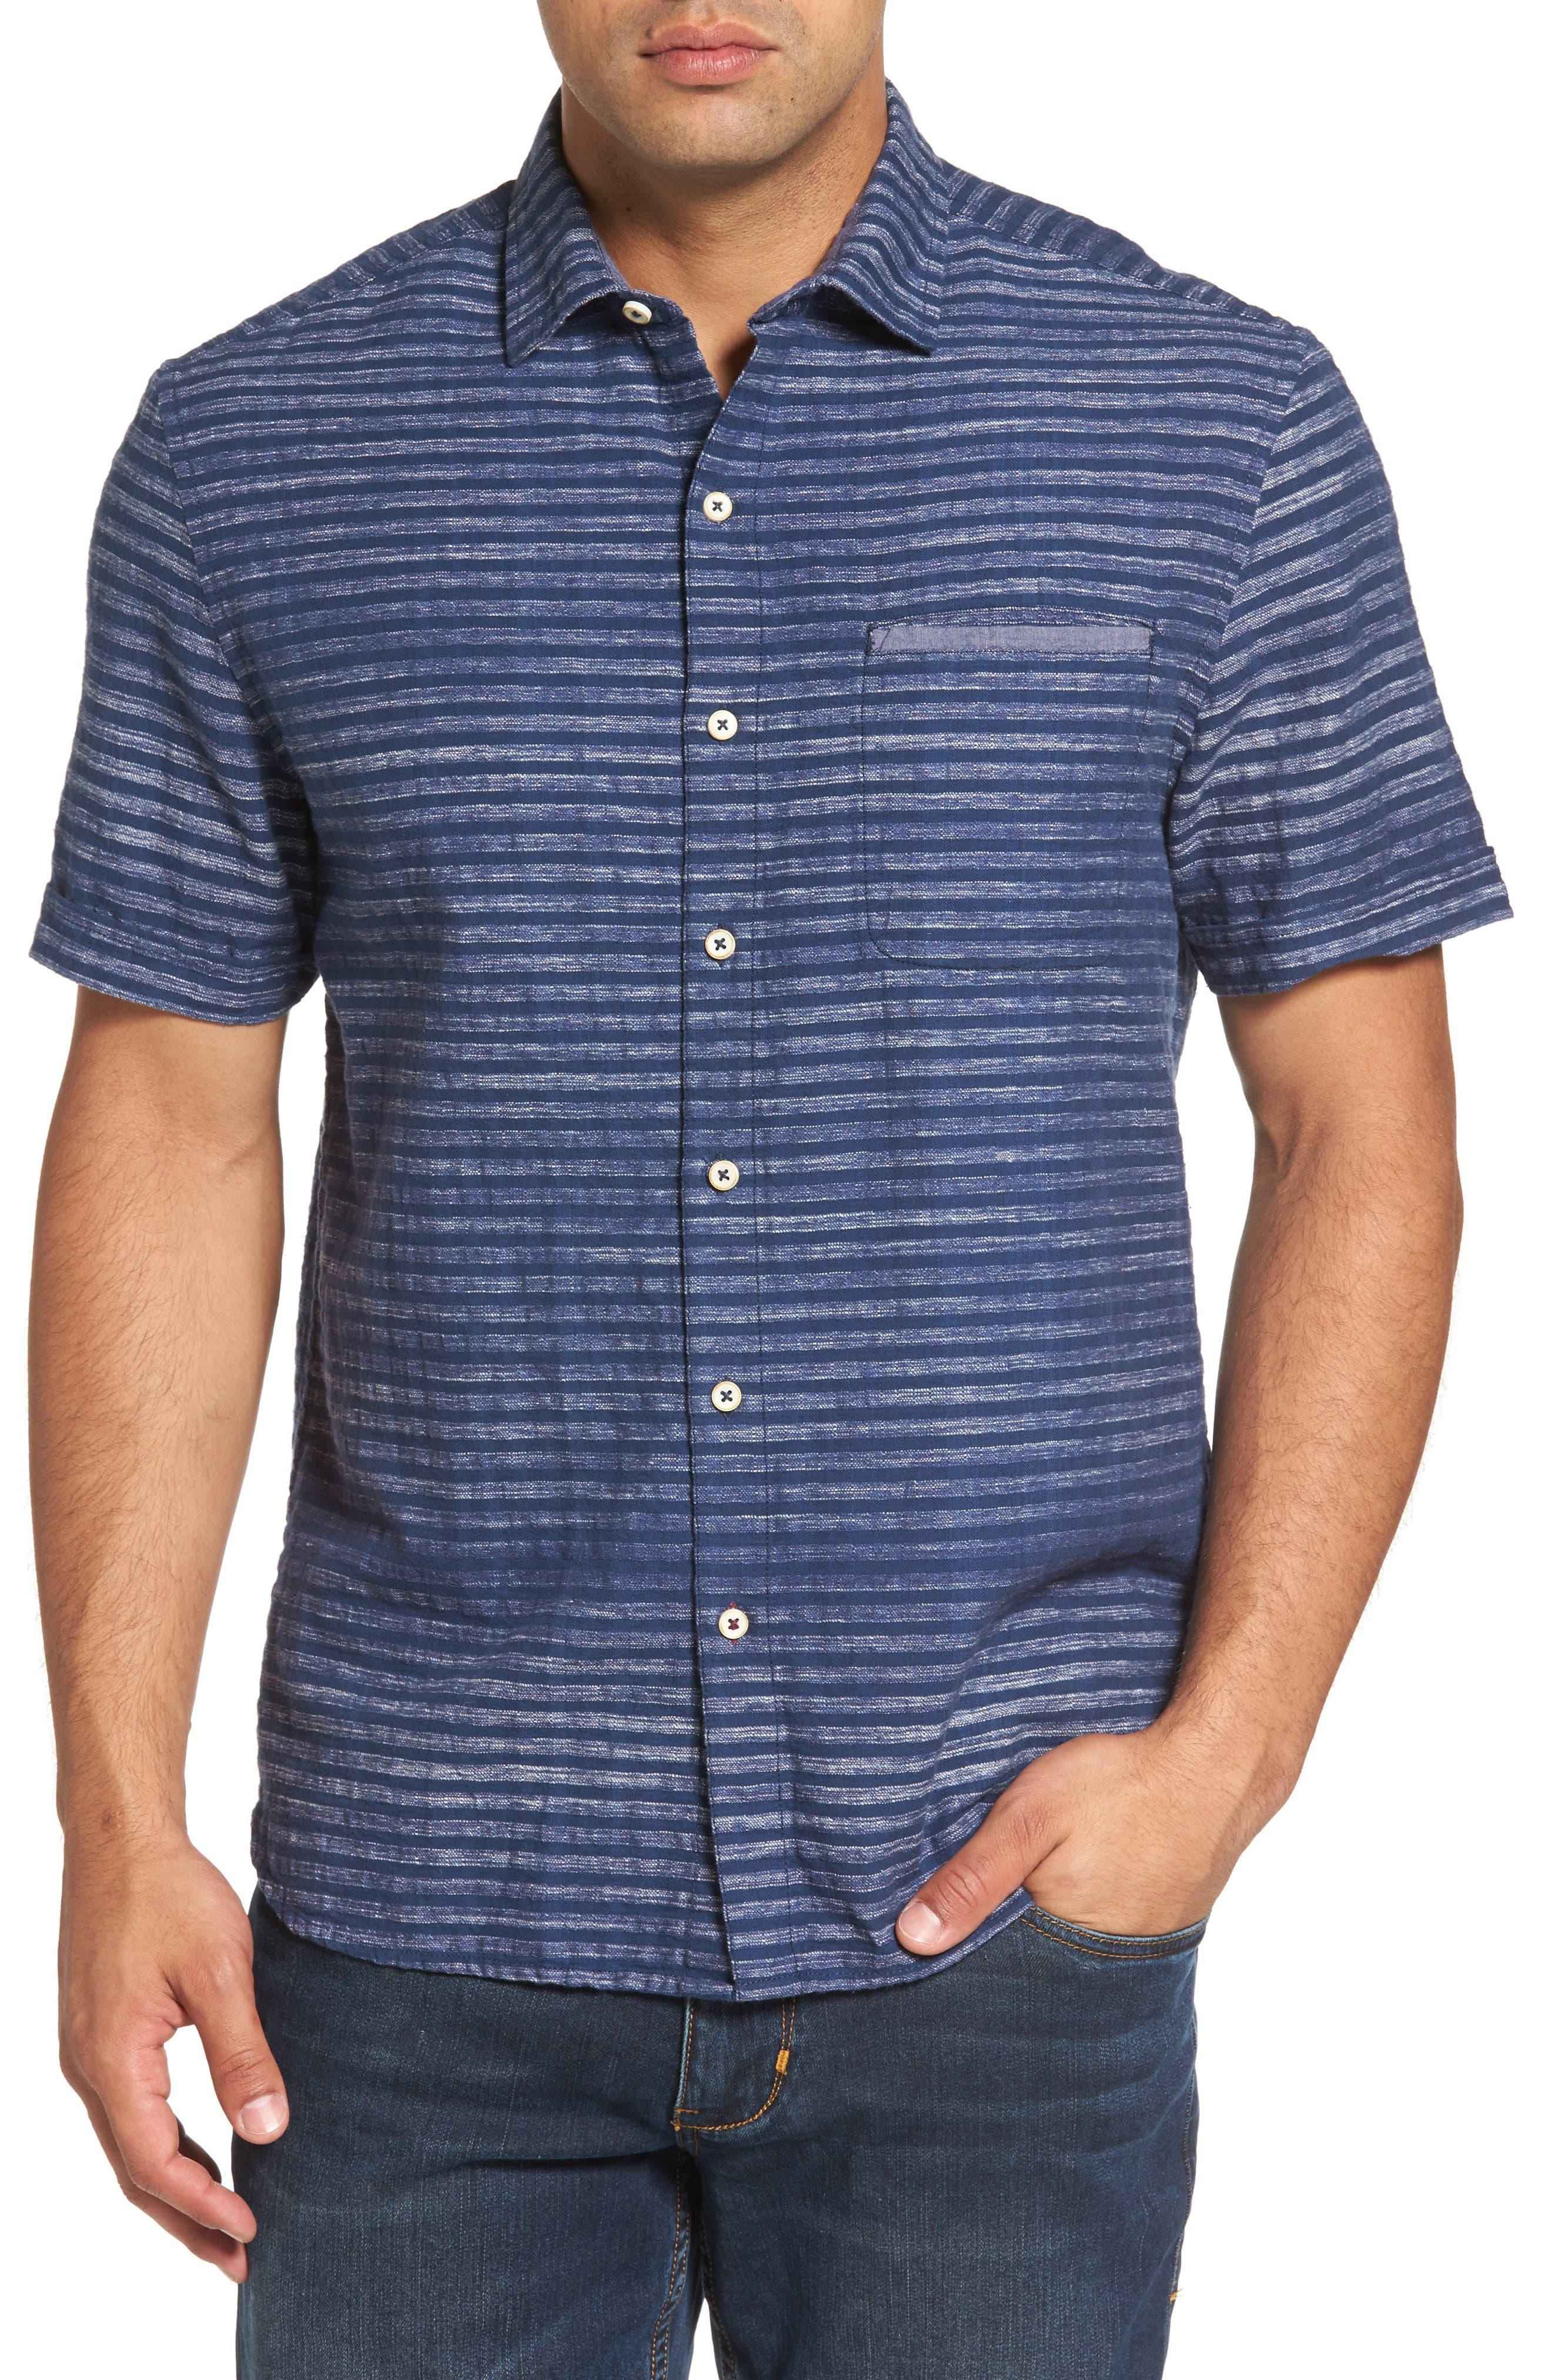 Alternate Image 1 Selected - Tommy Bahama Seaway Stripe Standard Fit Sport Shirt